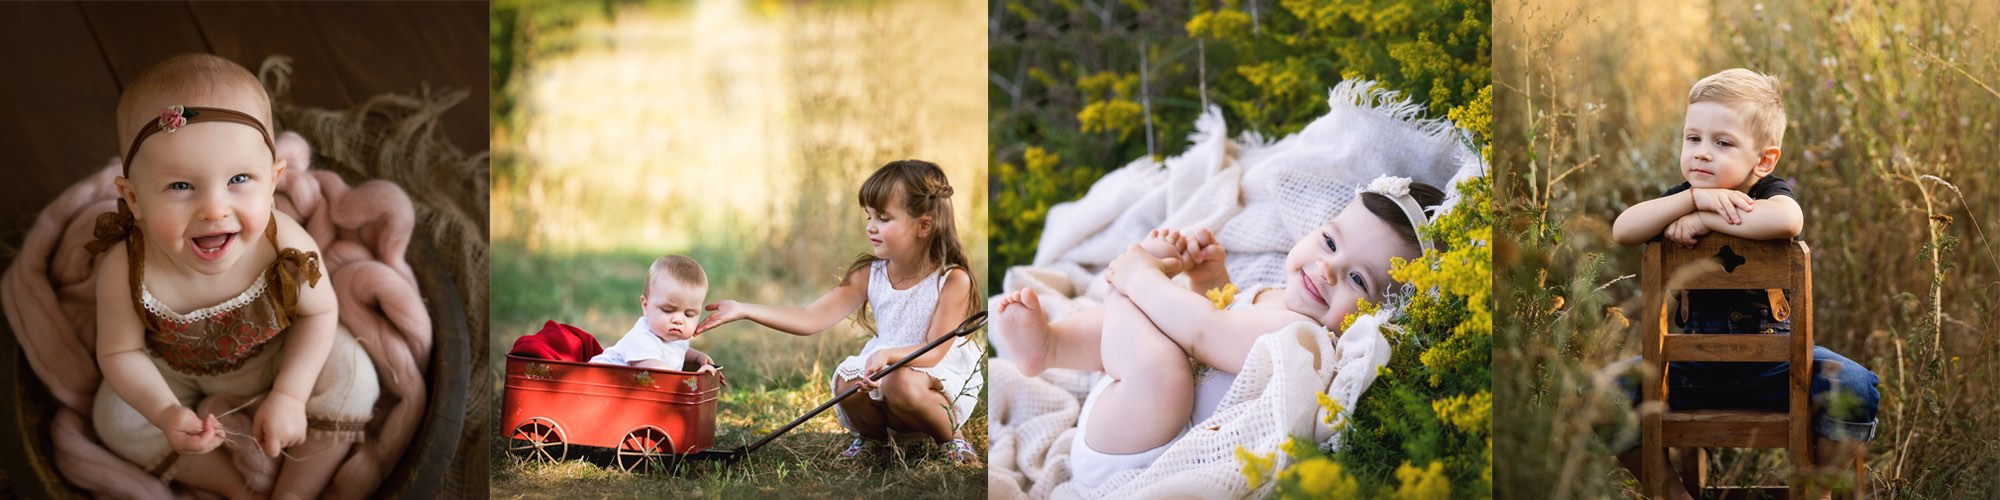 kleinkind-shooting-kinderfotograf-in-berlin-fotostudio-fuer-kinder-fotos